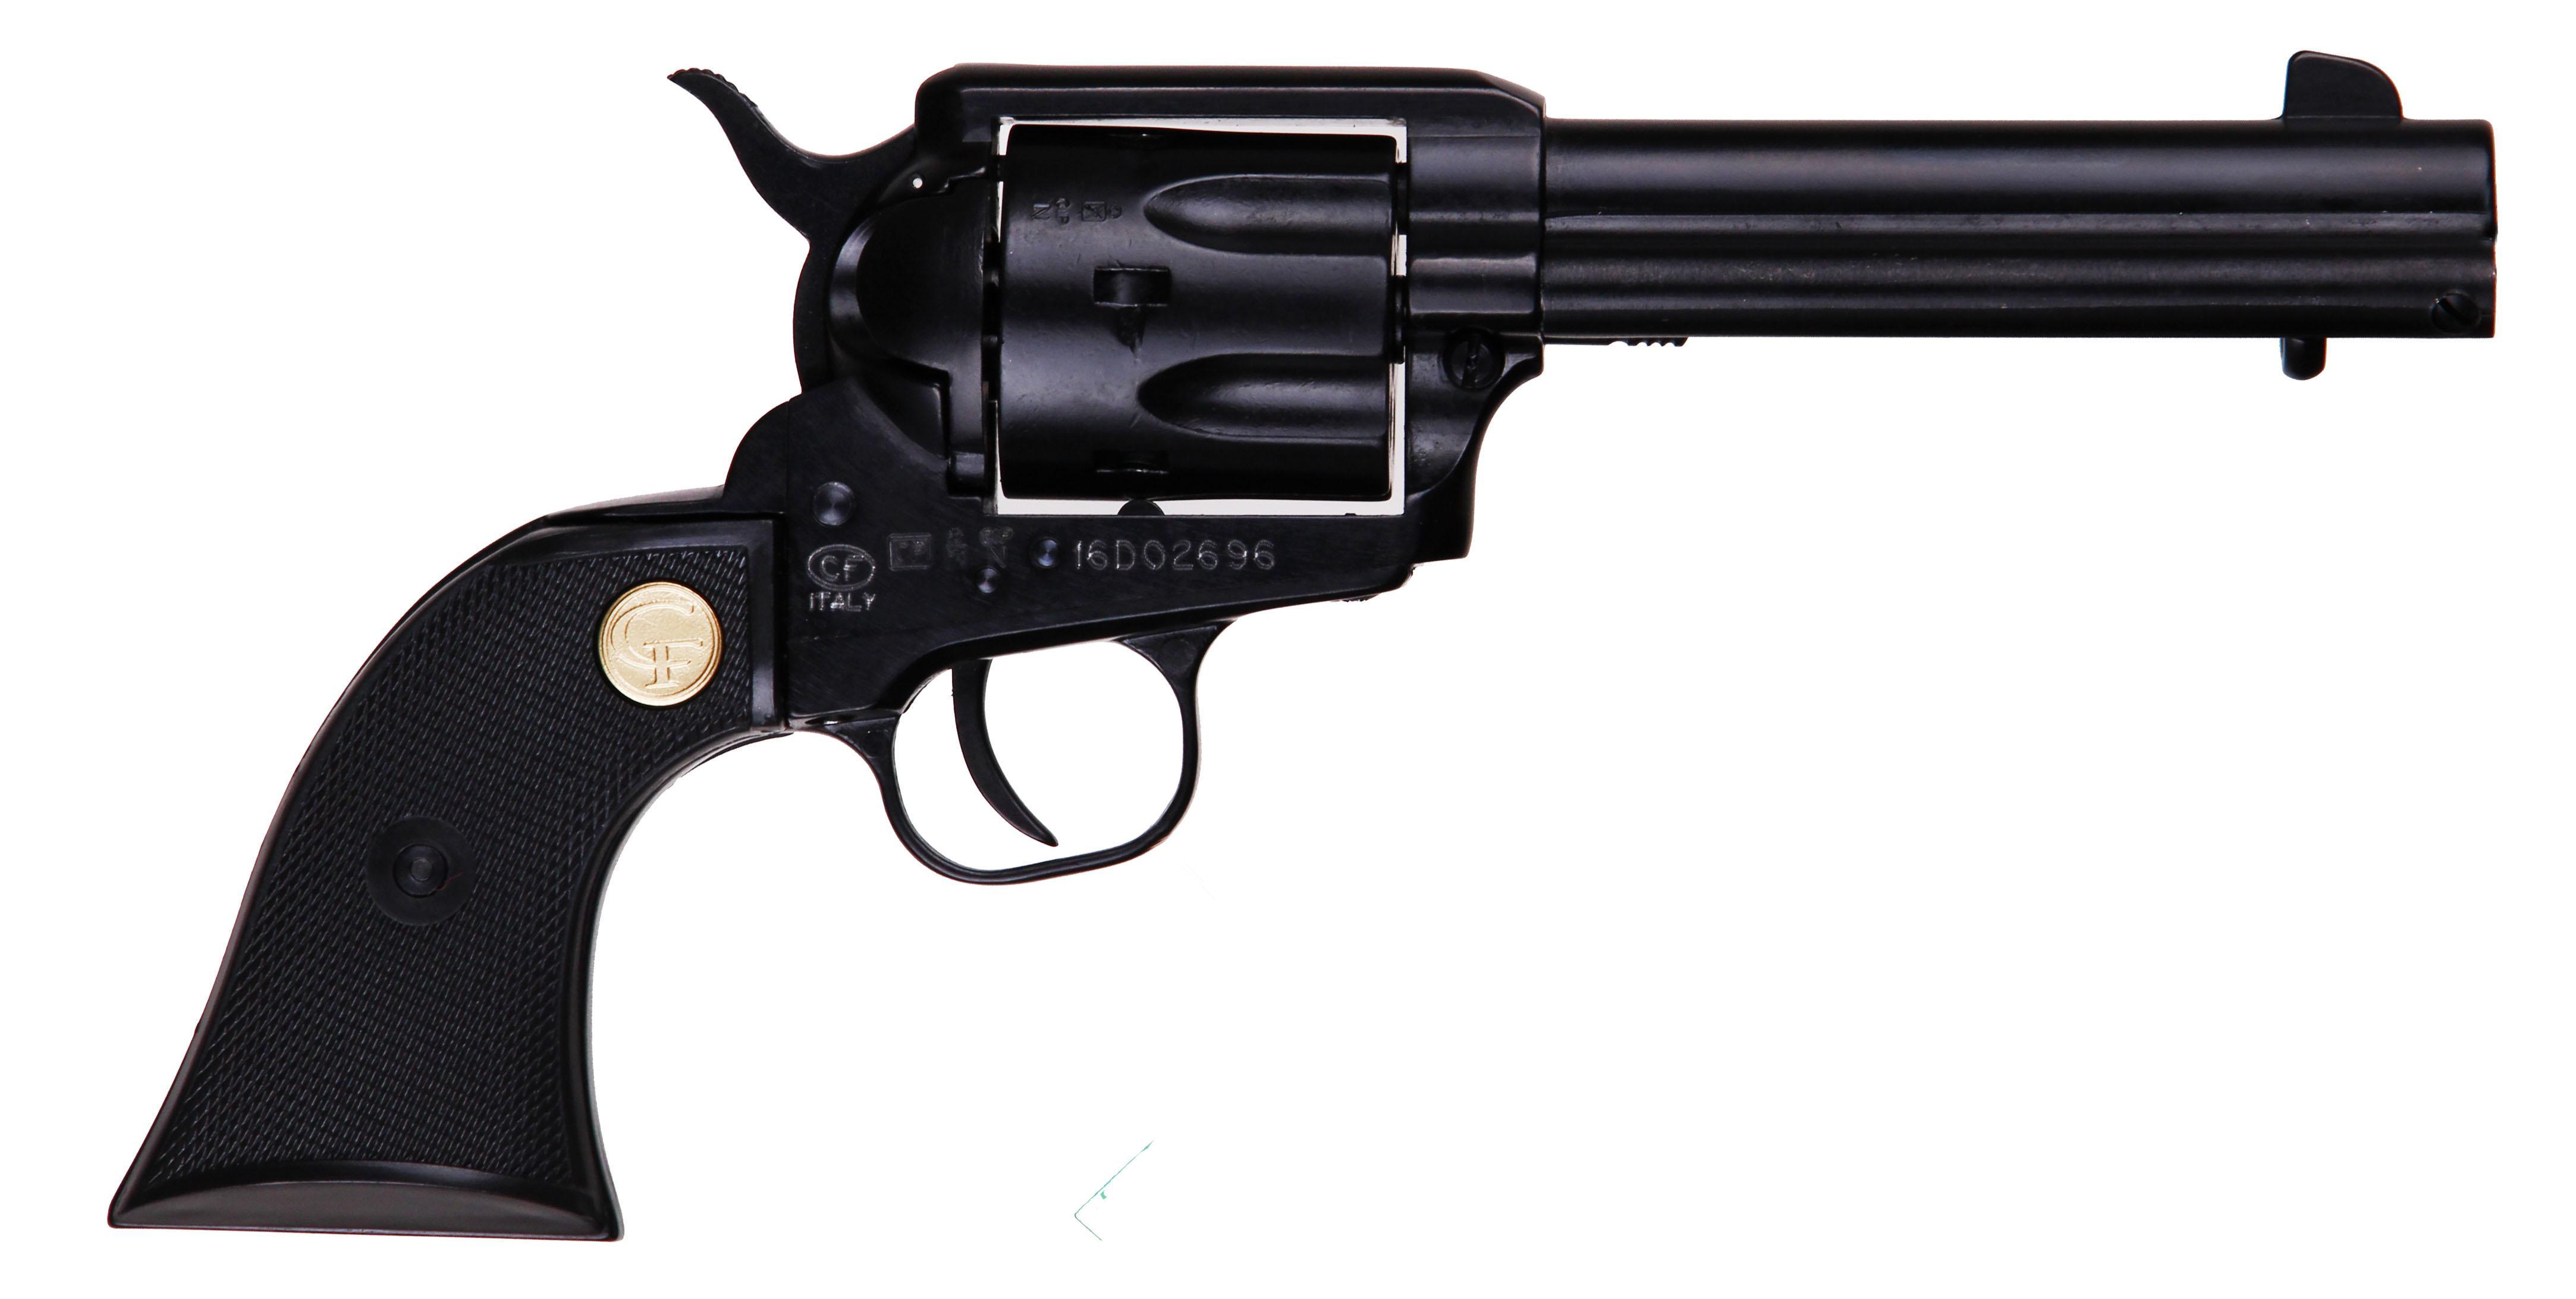 CHIAPPA 1873-22 22LR/22M BLACK - CF340.250D